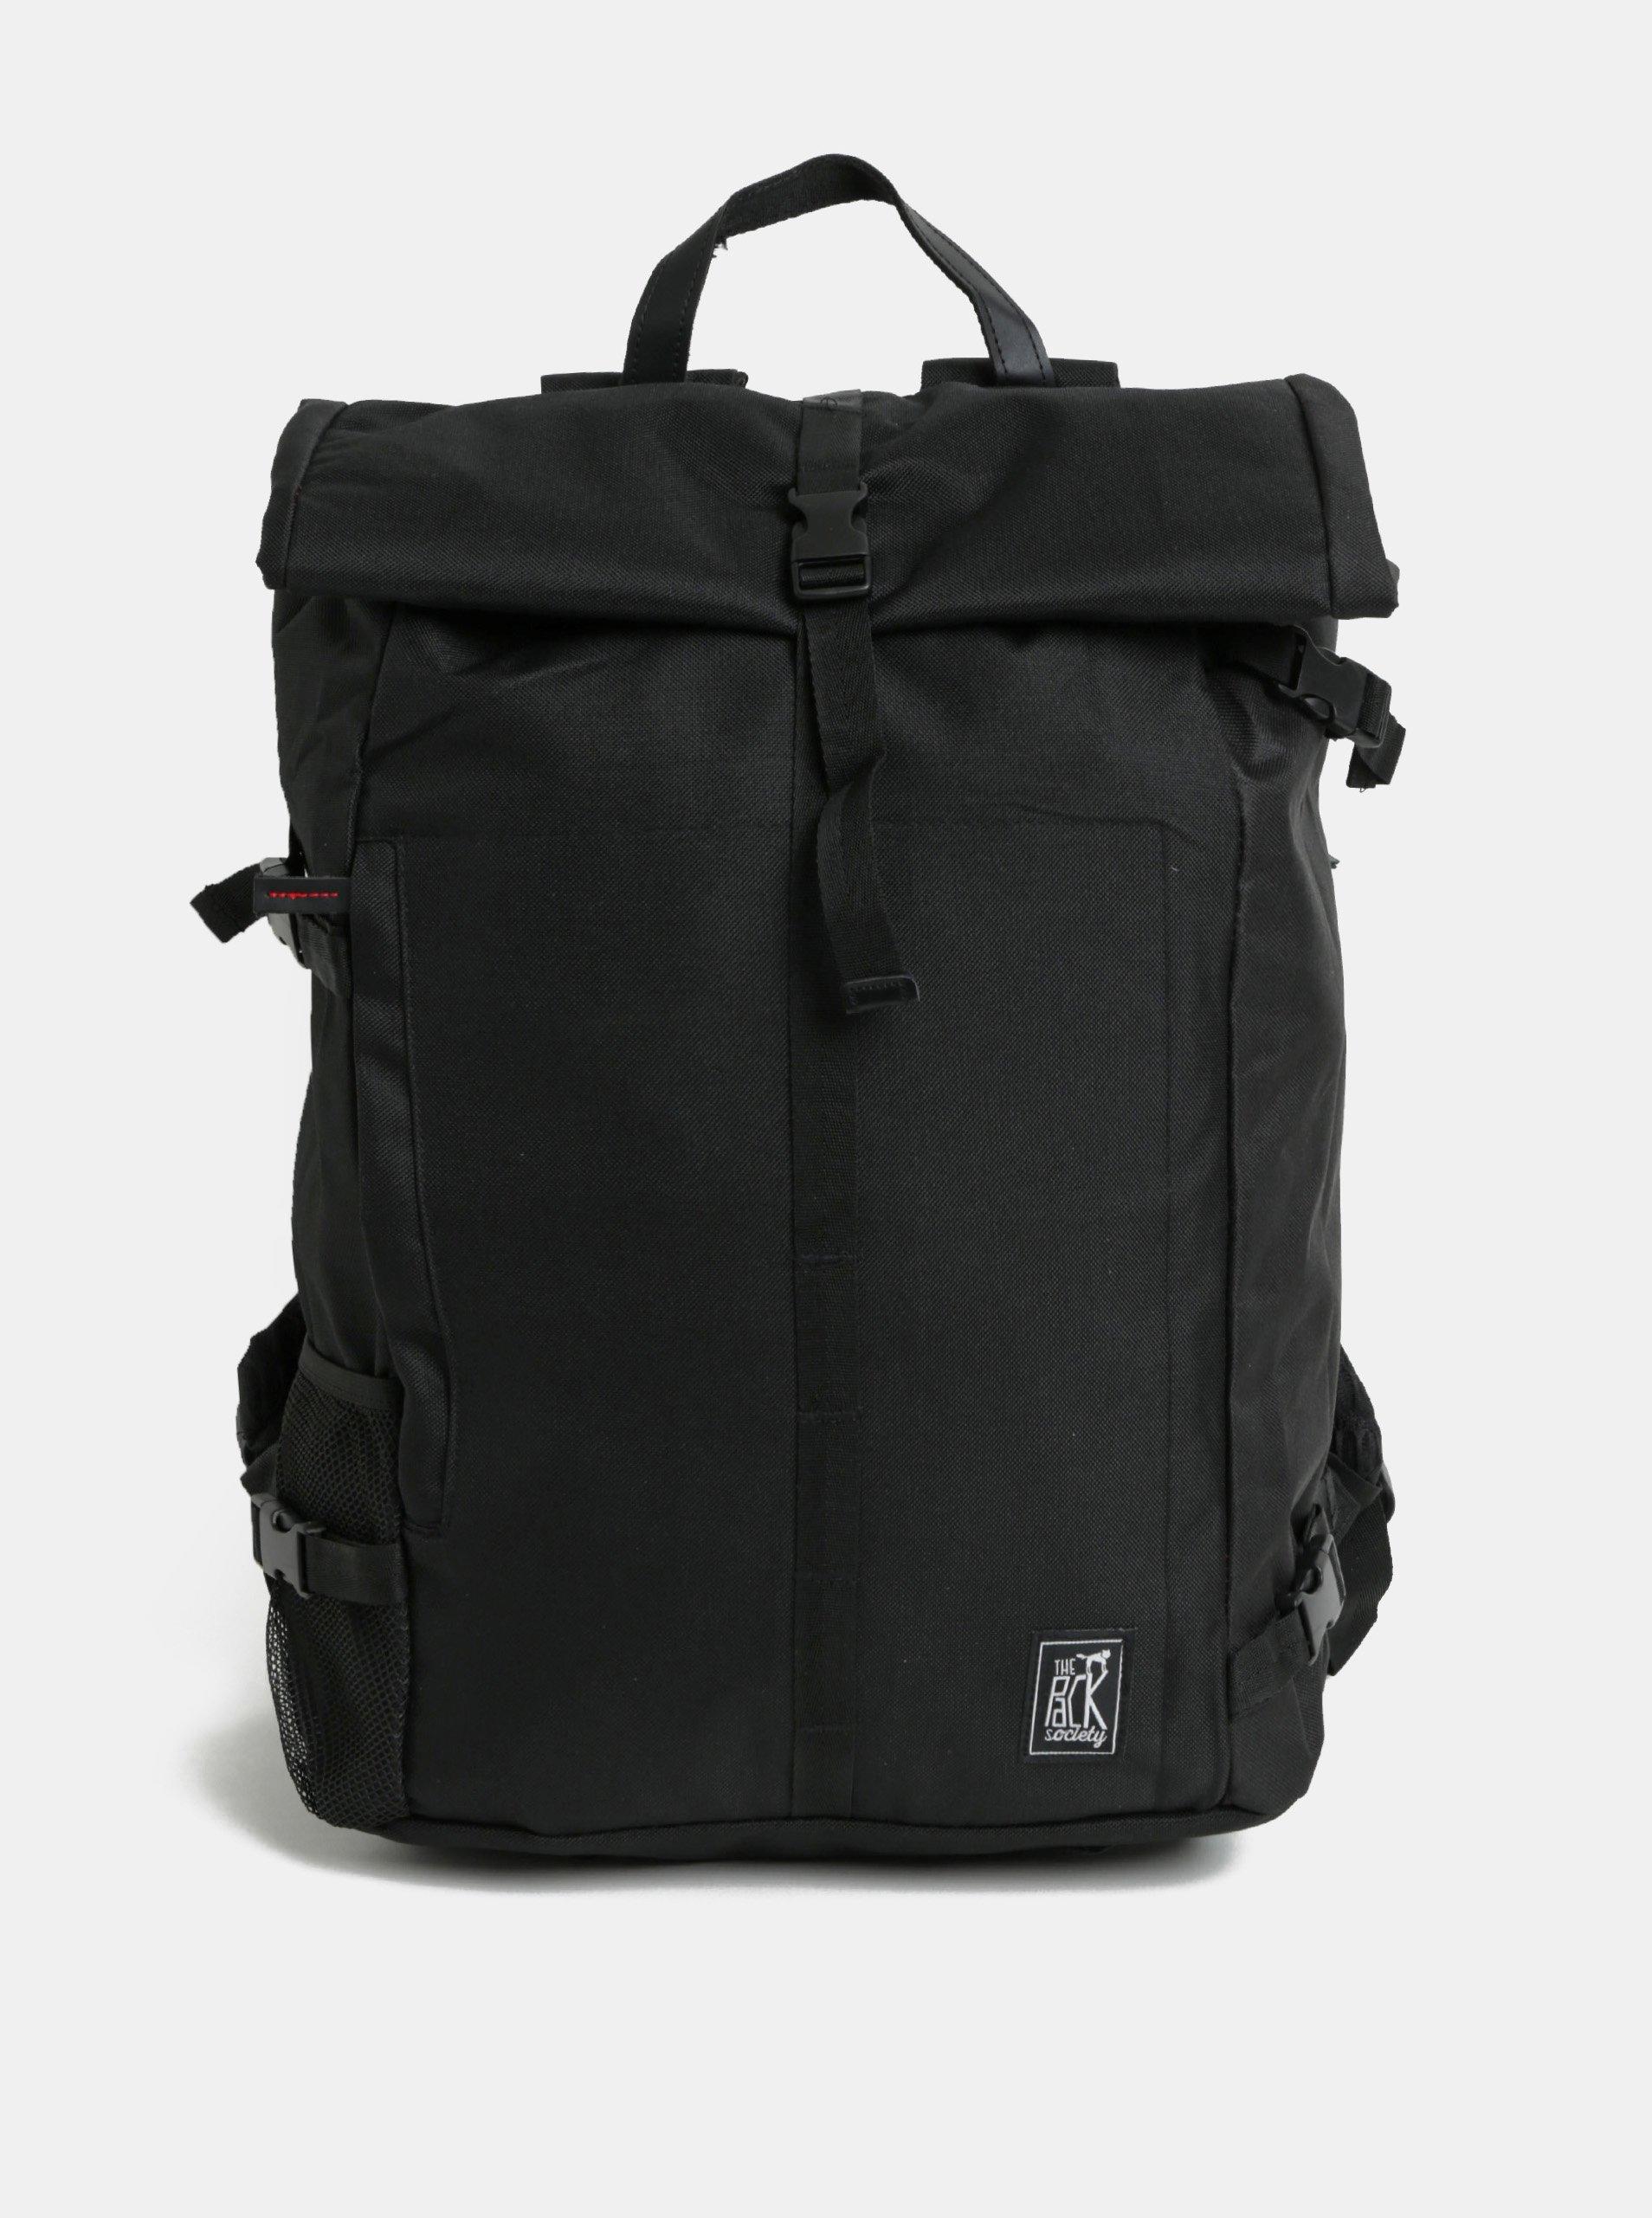 Černý batoh The Pack Society 25 l